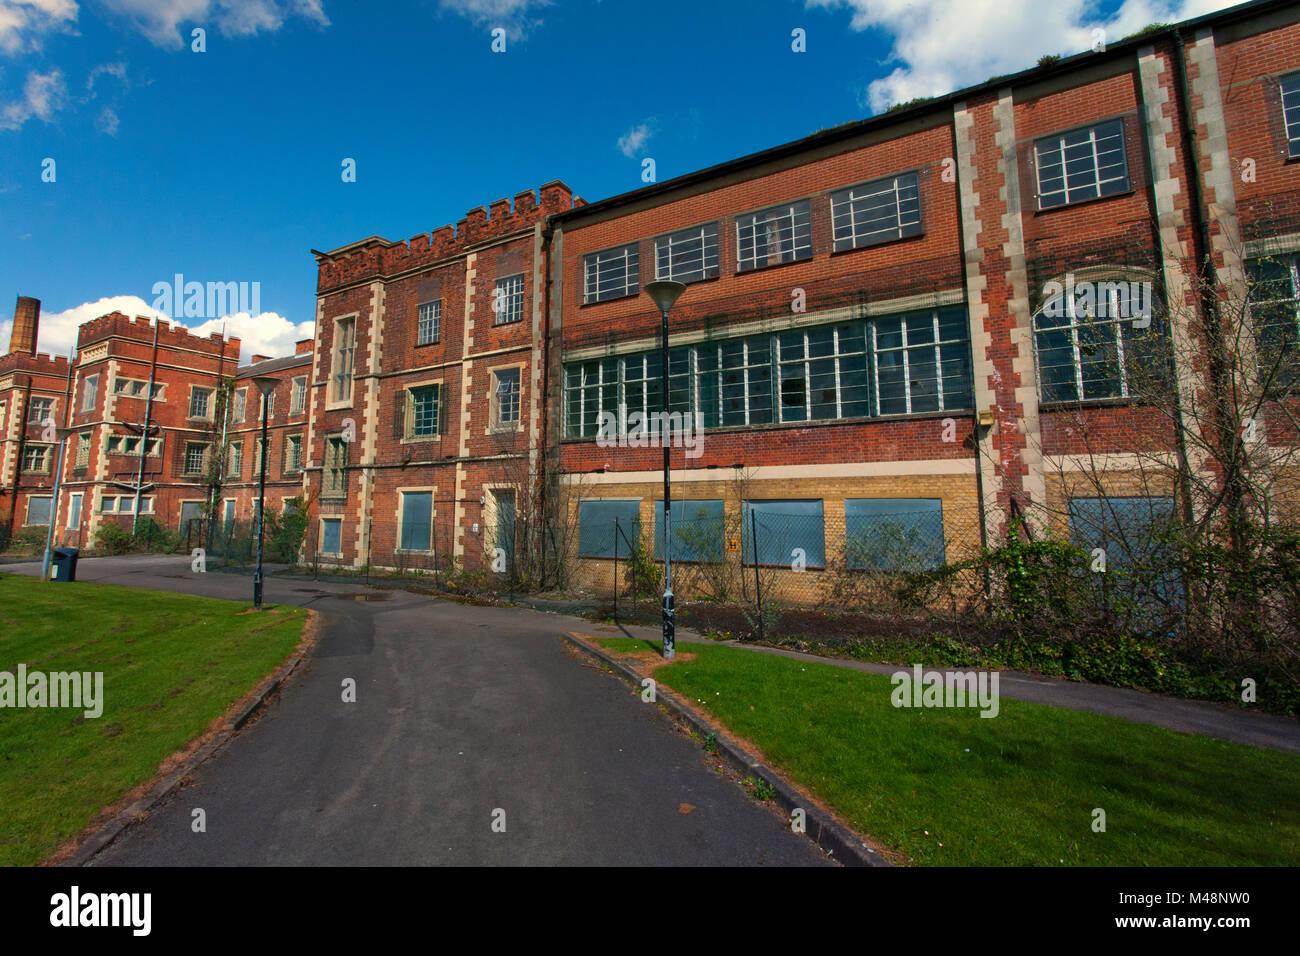 Springfield psychiatrischen Krankenhaus, Tooting, London, England, UK. Credit: London Snapper Stockbild